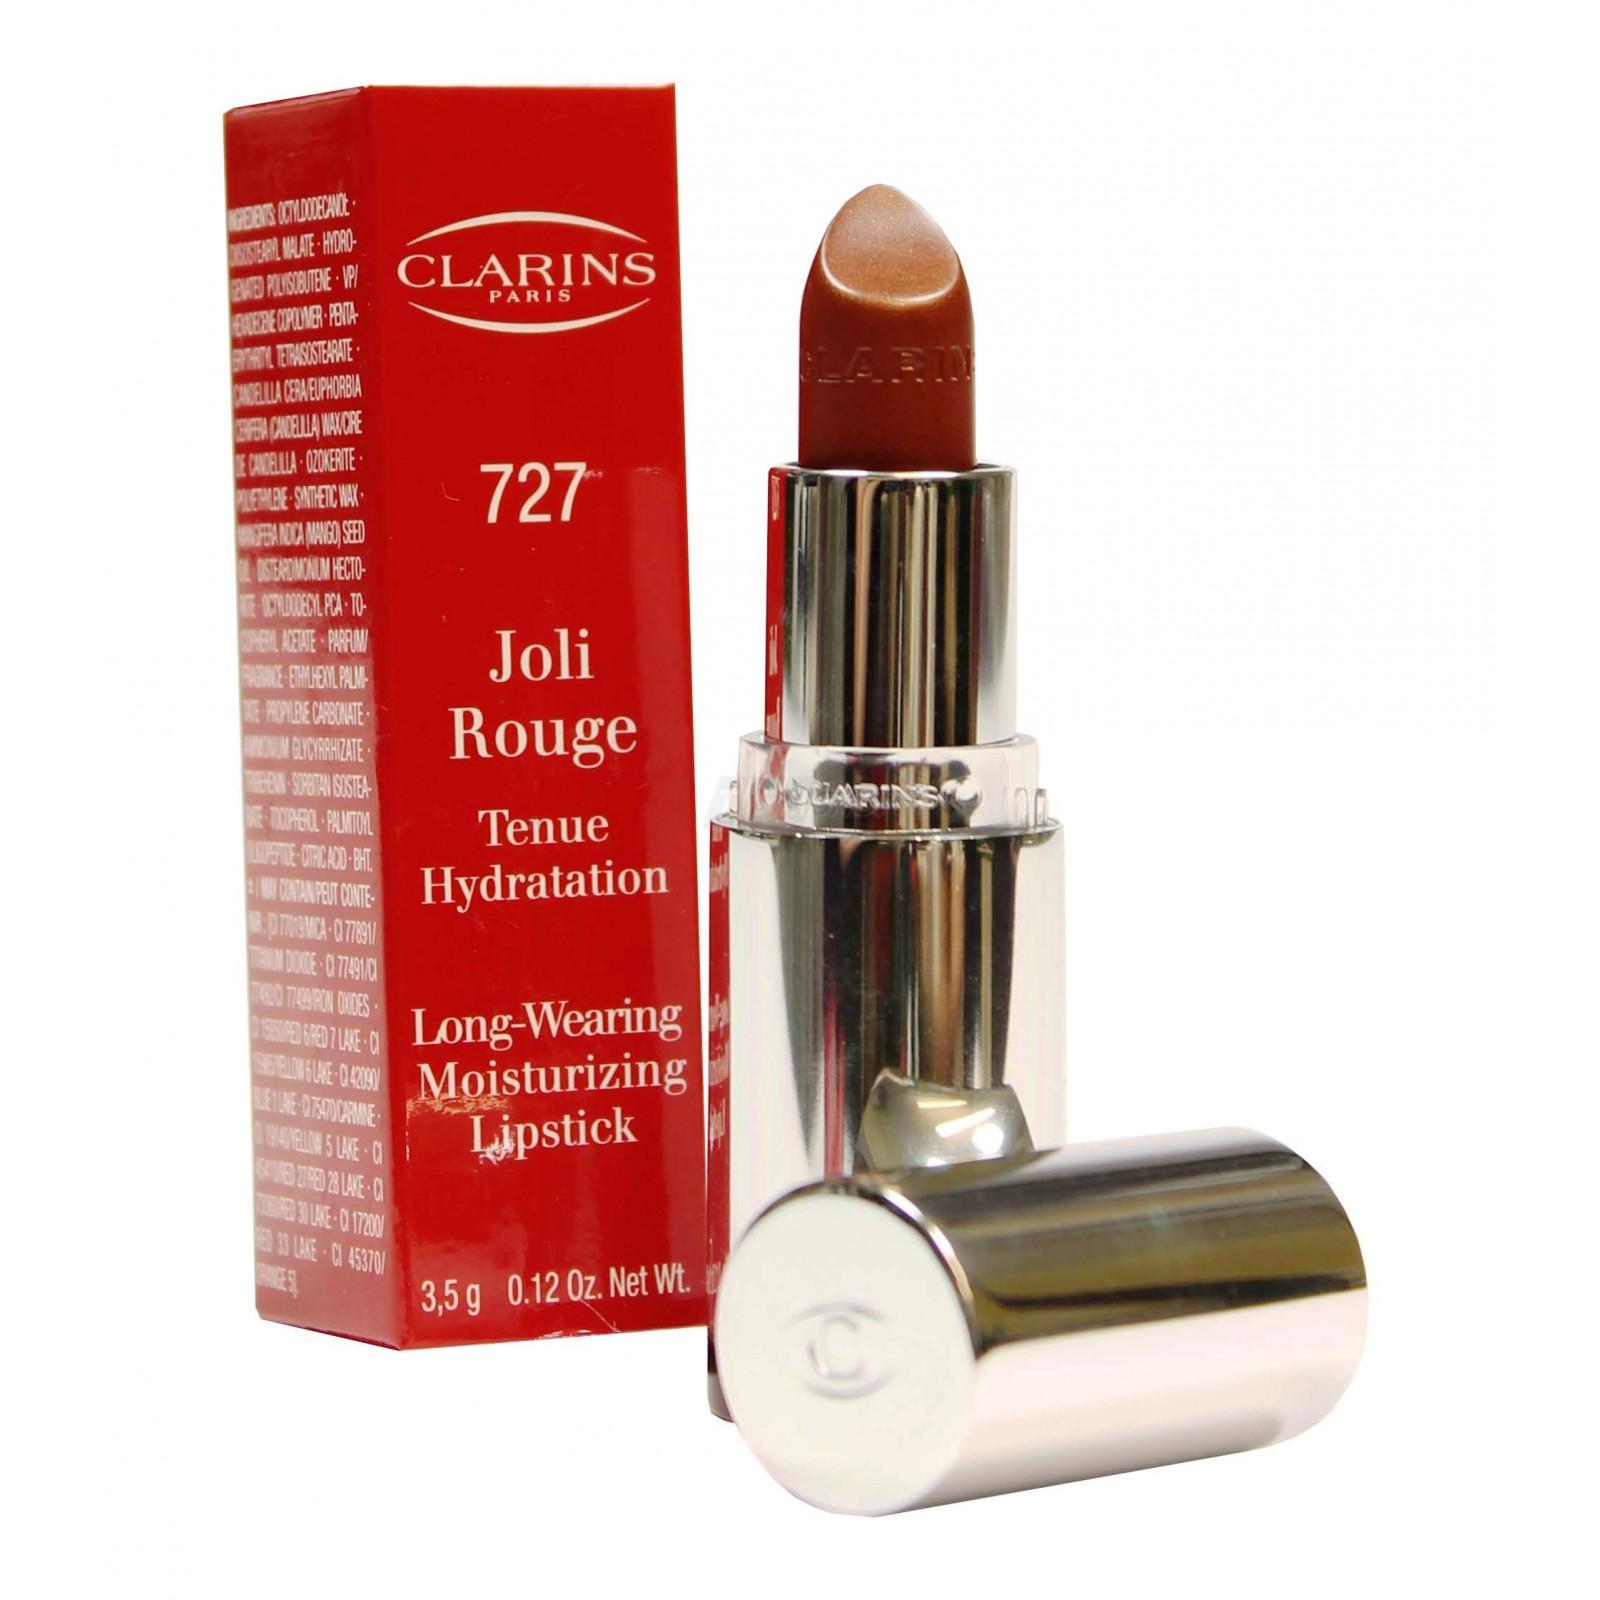 Clarins -Joli Rouge -Tenue Hydratation -Moisturizing - 727 gold plum Lippenstift